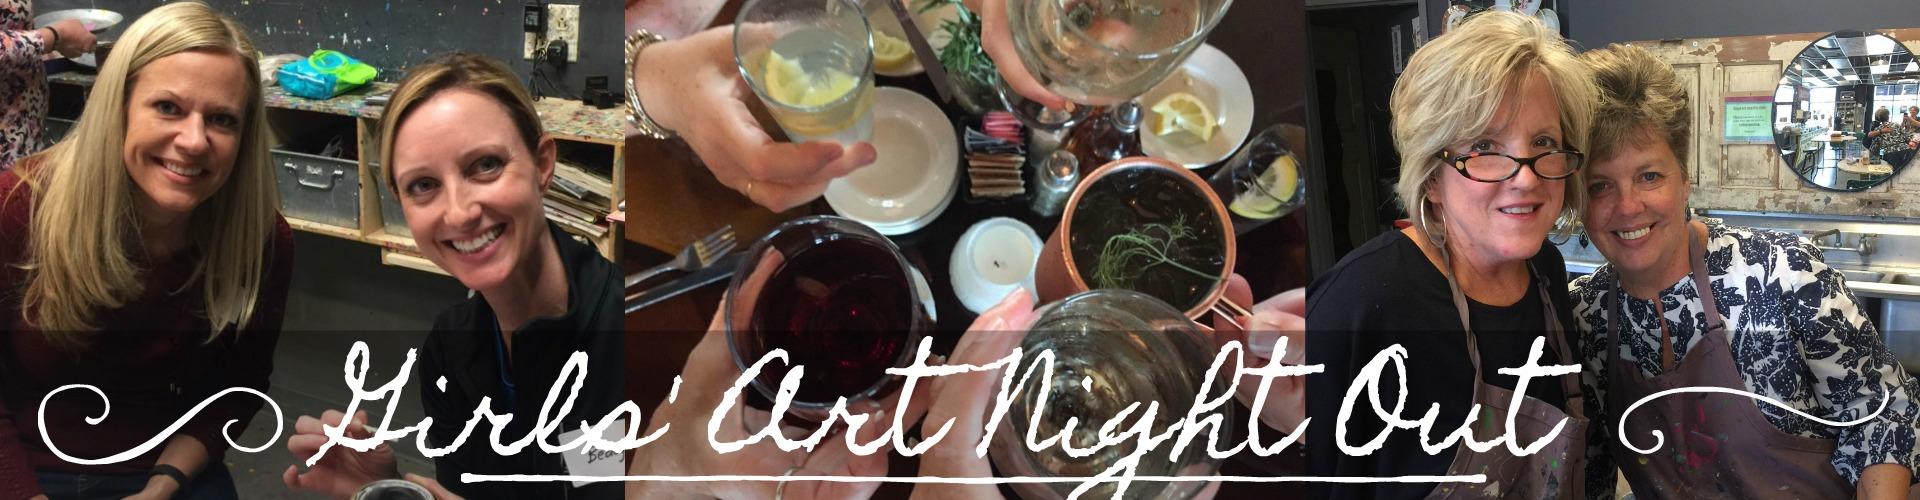 Girls' Art Night Out GANO